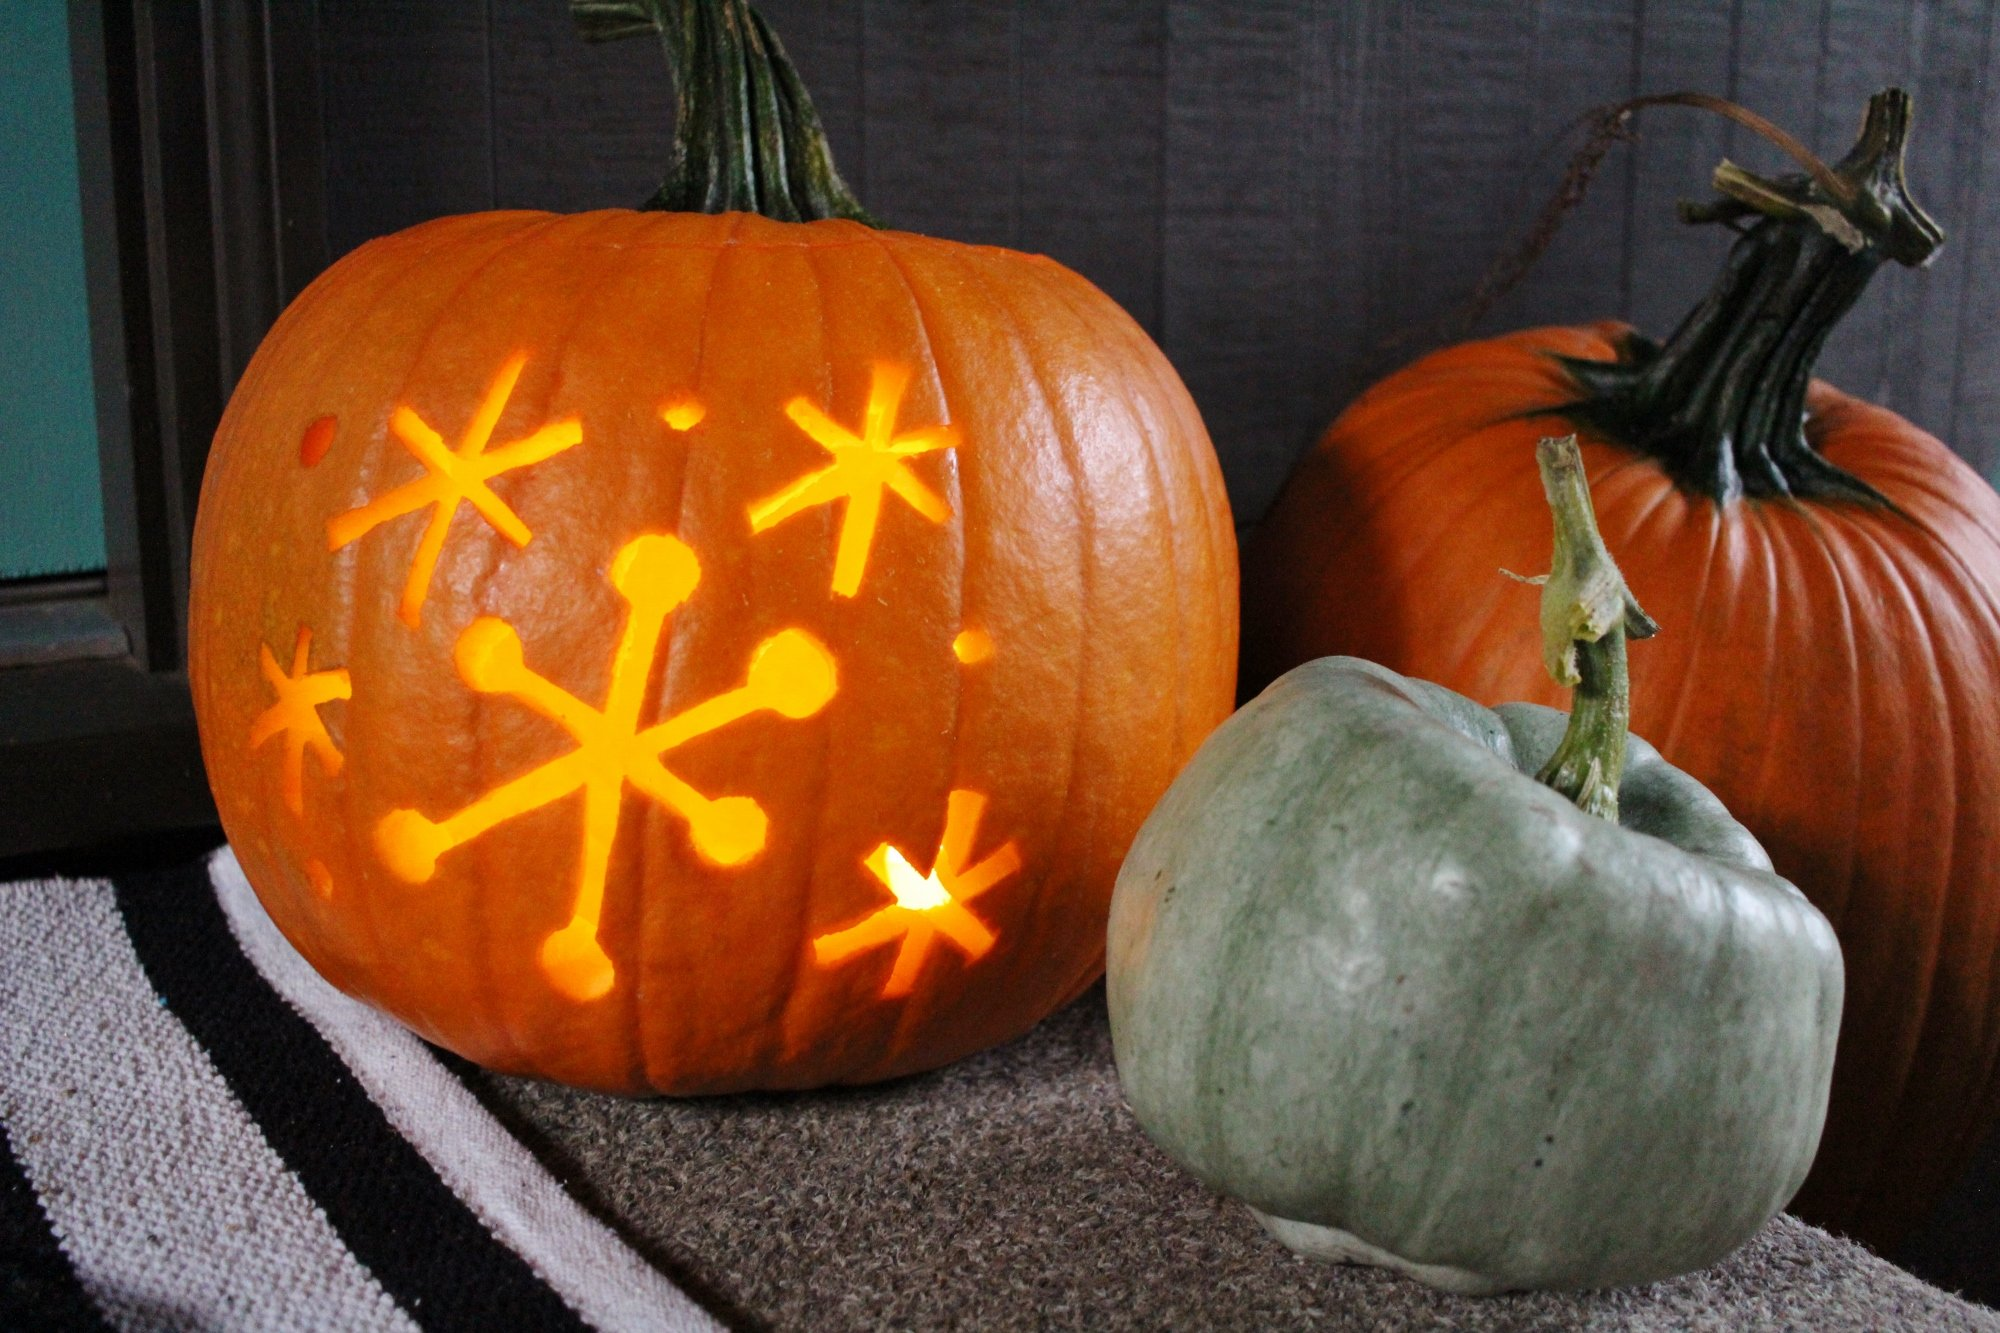 Sputnik jack o'lantern for retro Halloween